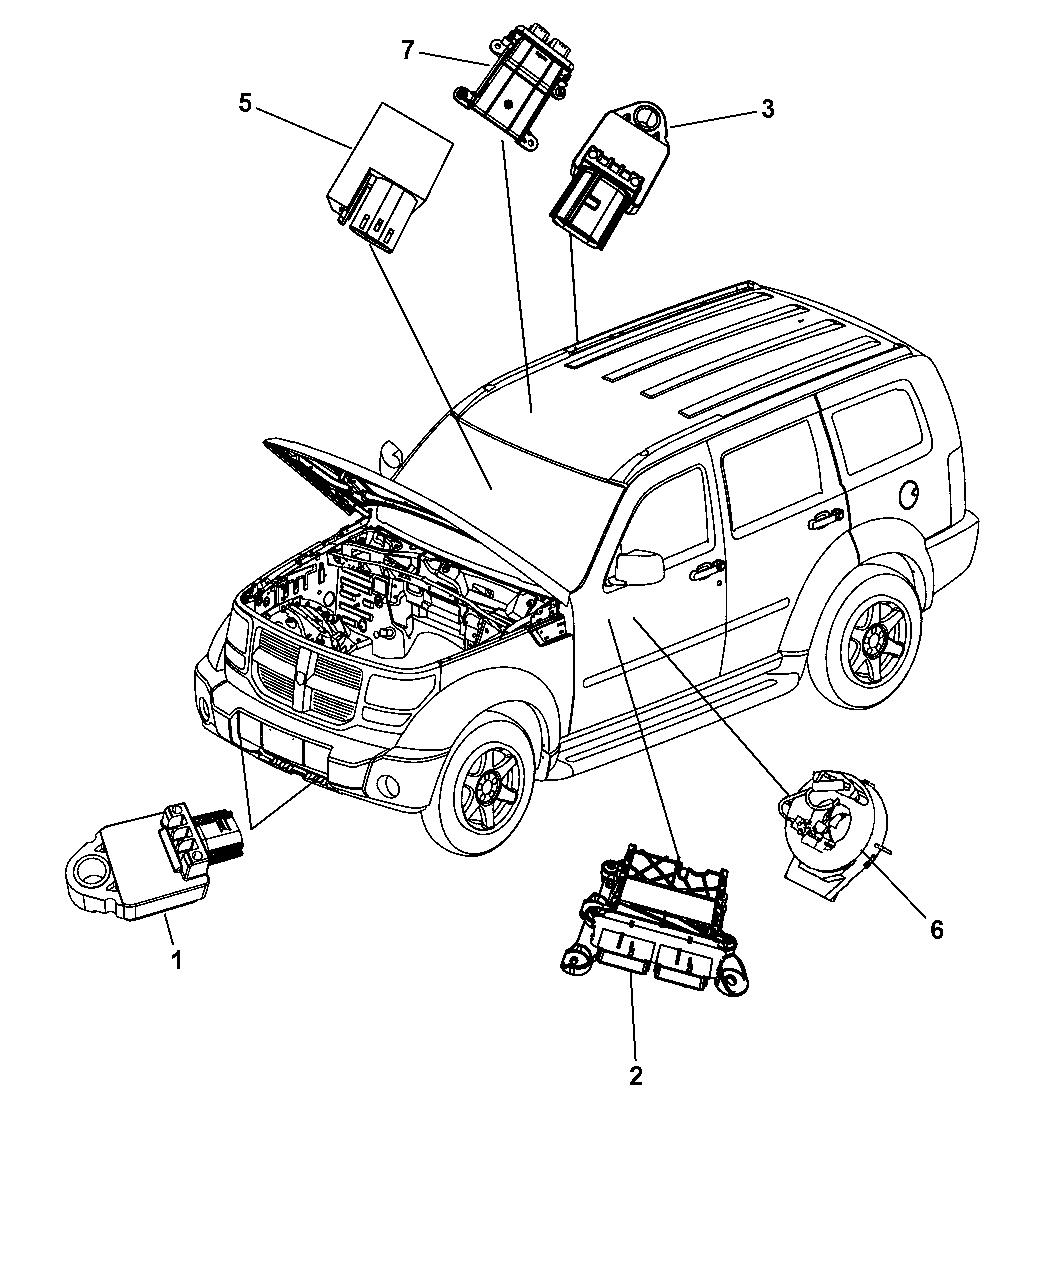 2008 Jeep Liberty Air Bag Modules Impact Sensor & Clock